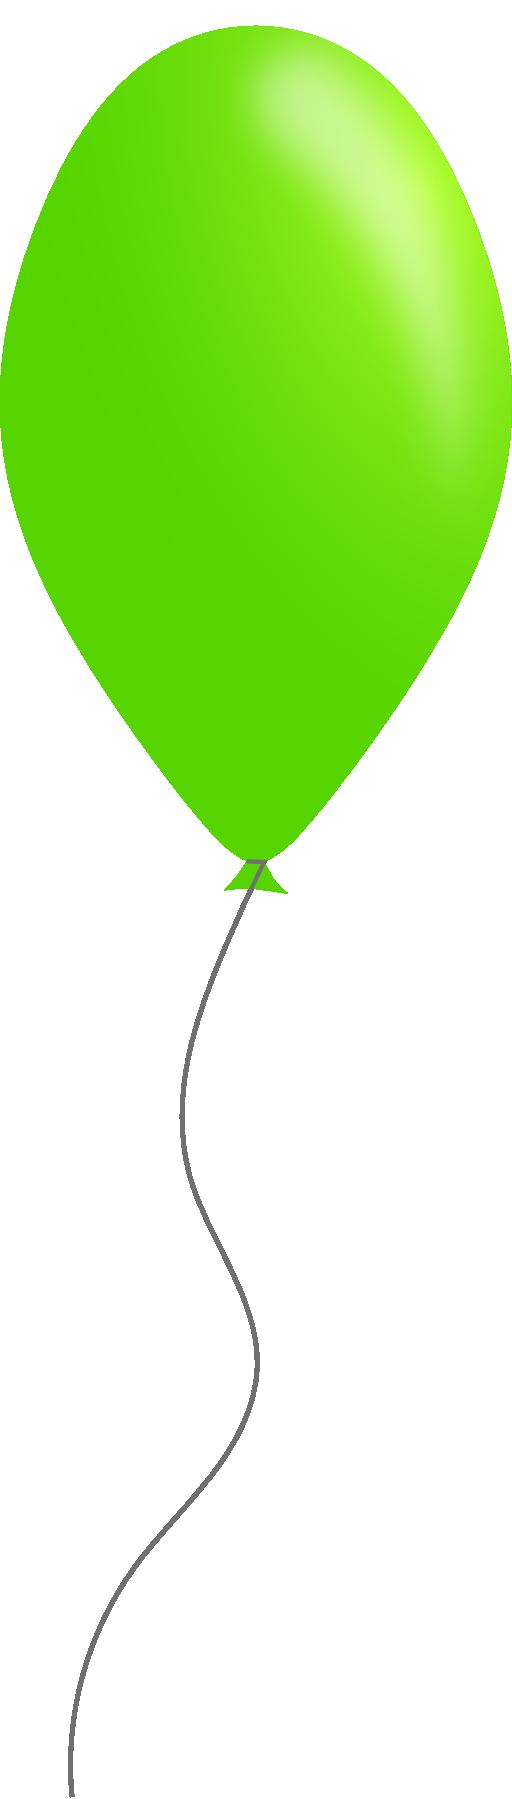 Green panda free images. Clipart balloon single